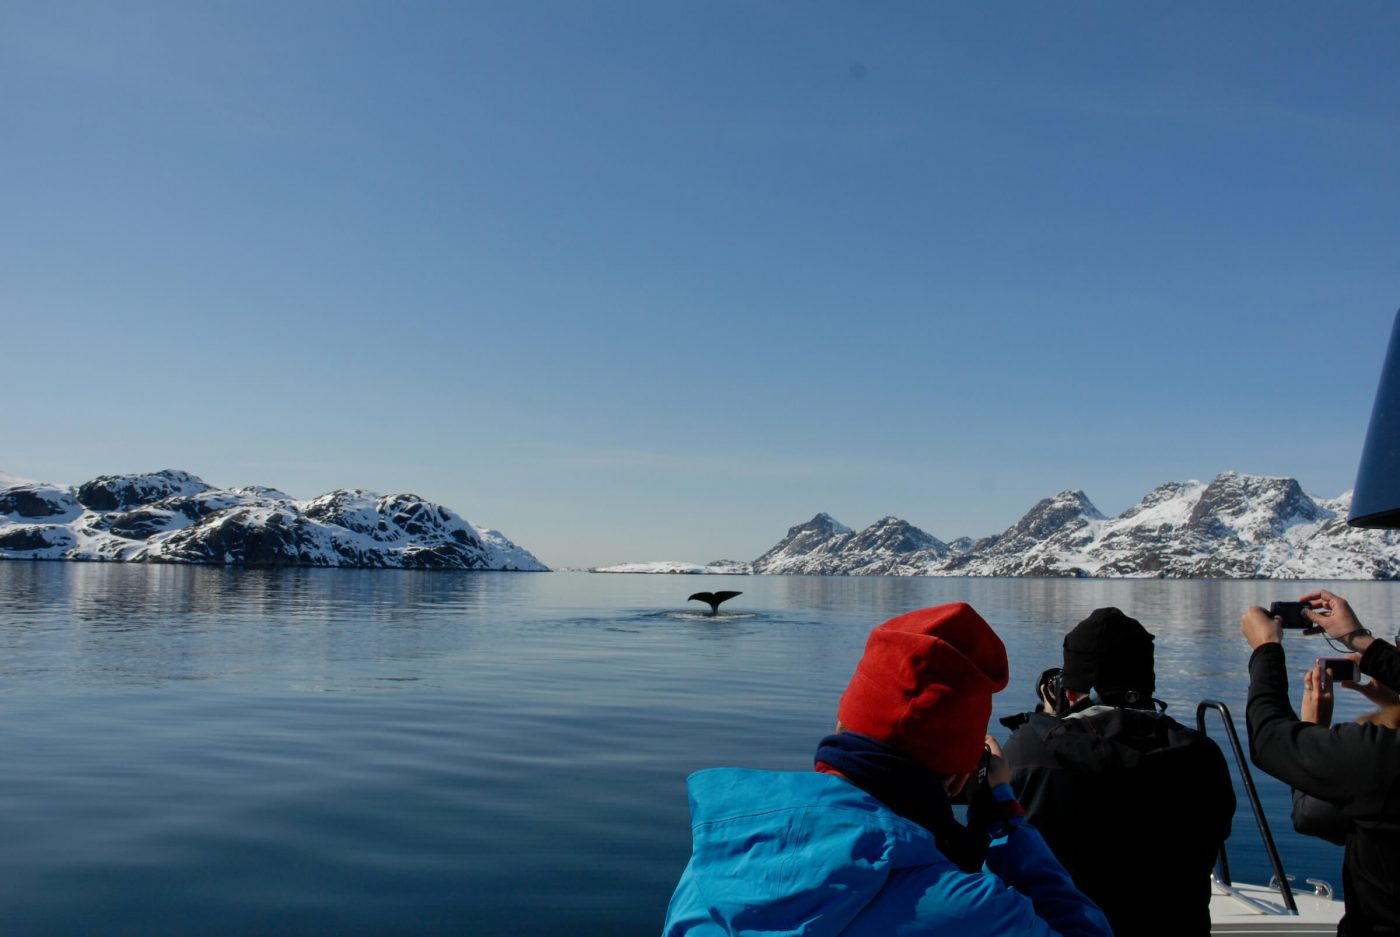 Whales at the Eternity Fjord Maniitsoq. Photo by Jörg Ehrligh